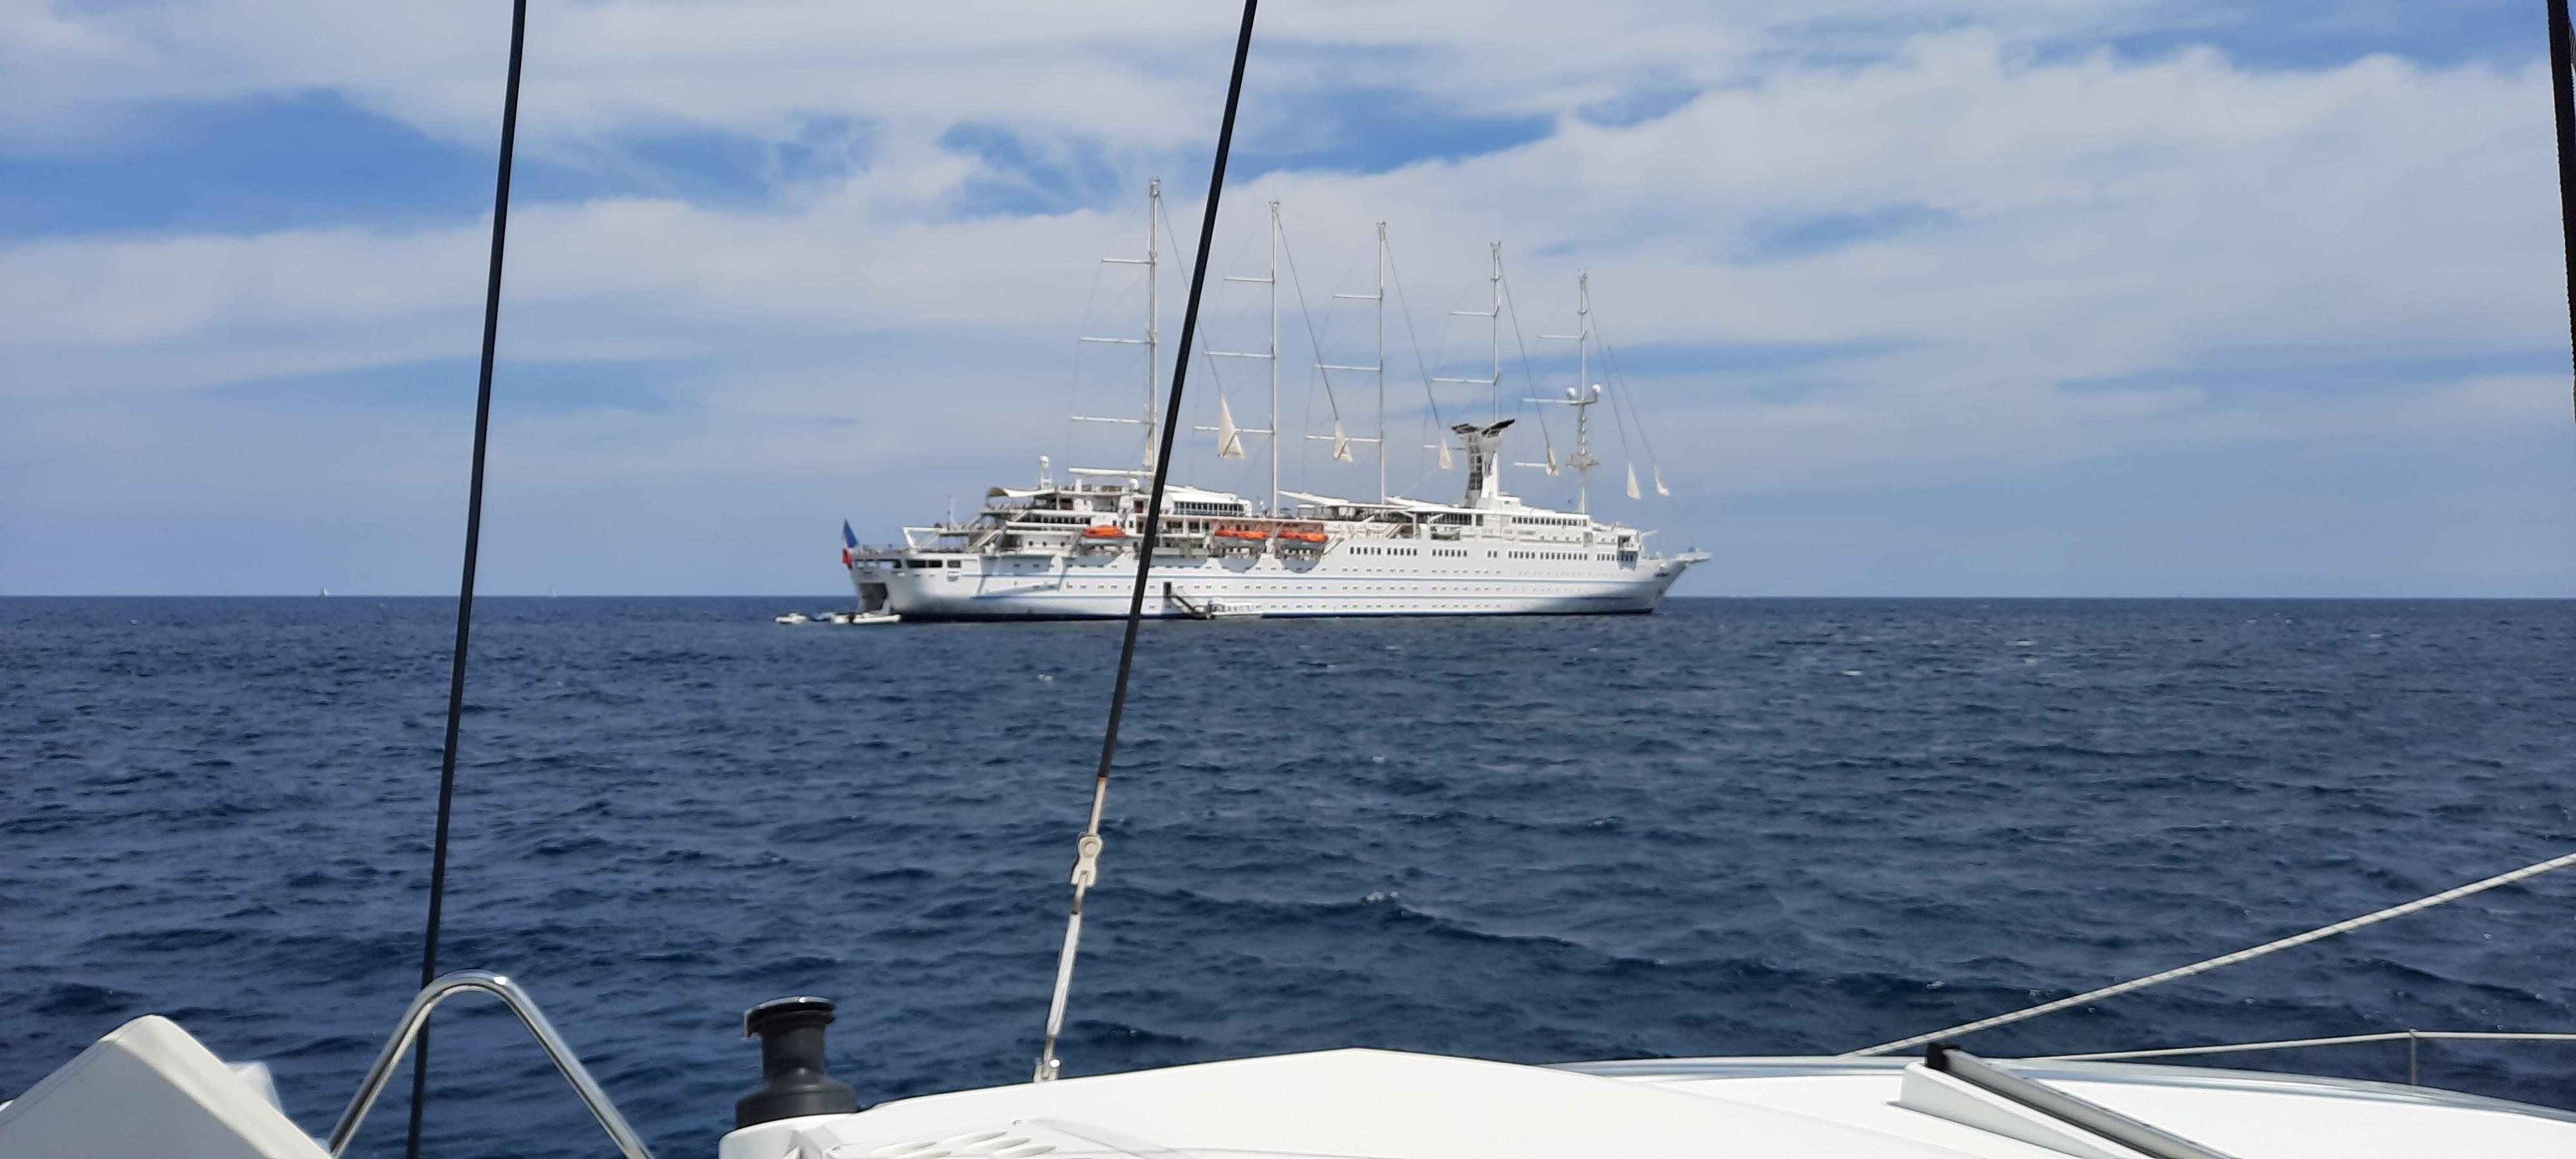 Rencontre du Club Med 2 avec un Bali 4.1